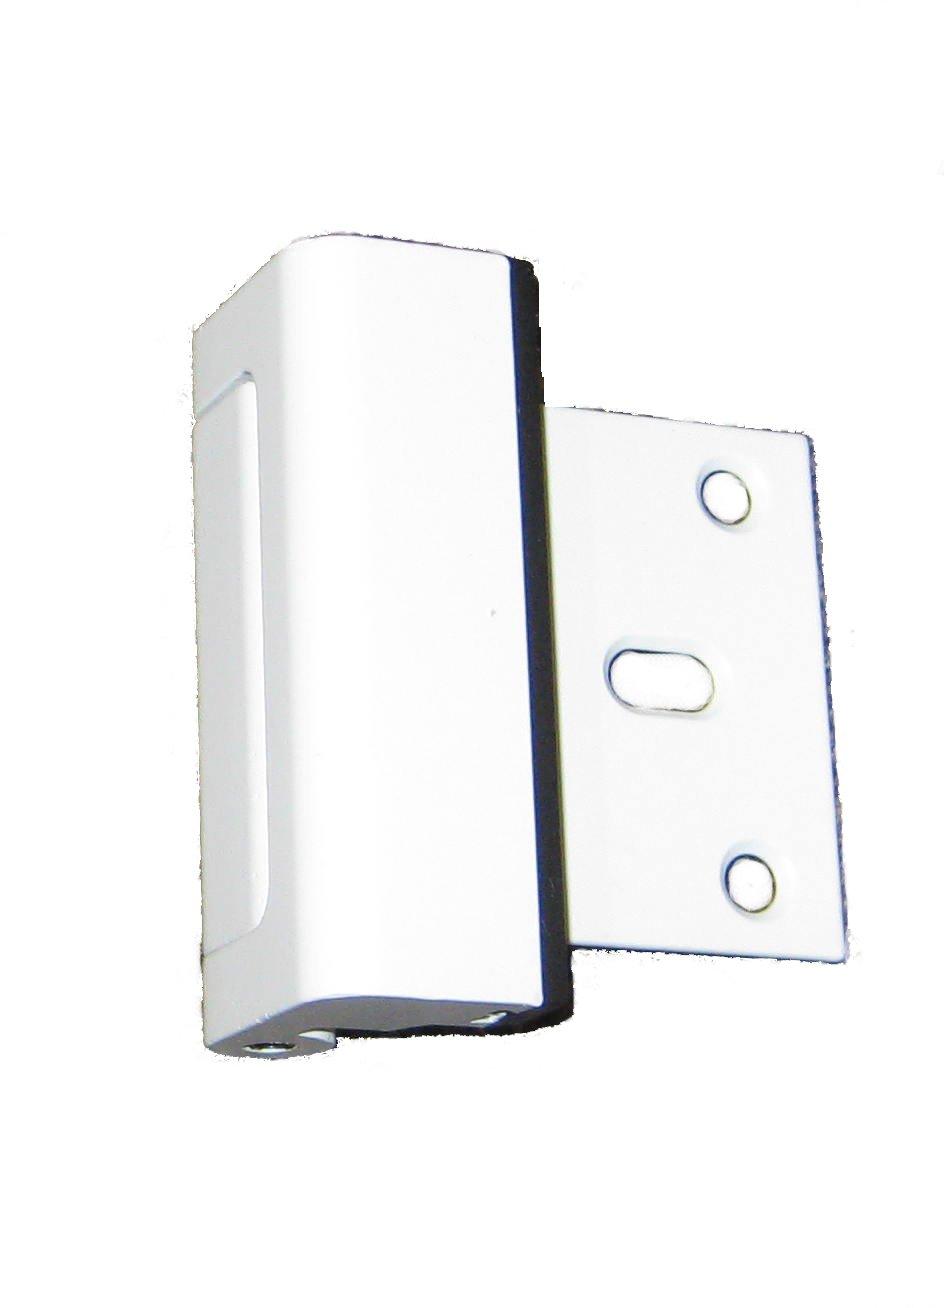 Amazon.com : Cardinal Gates Door Guardian White : Indoor Safety Gates : Baby